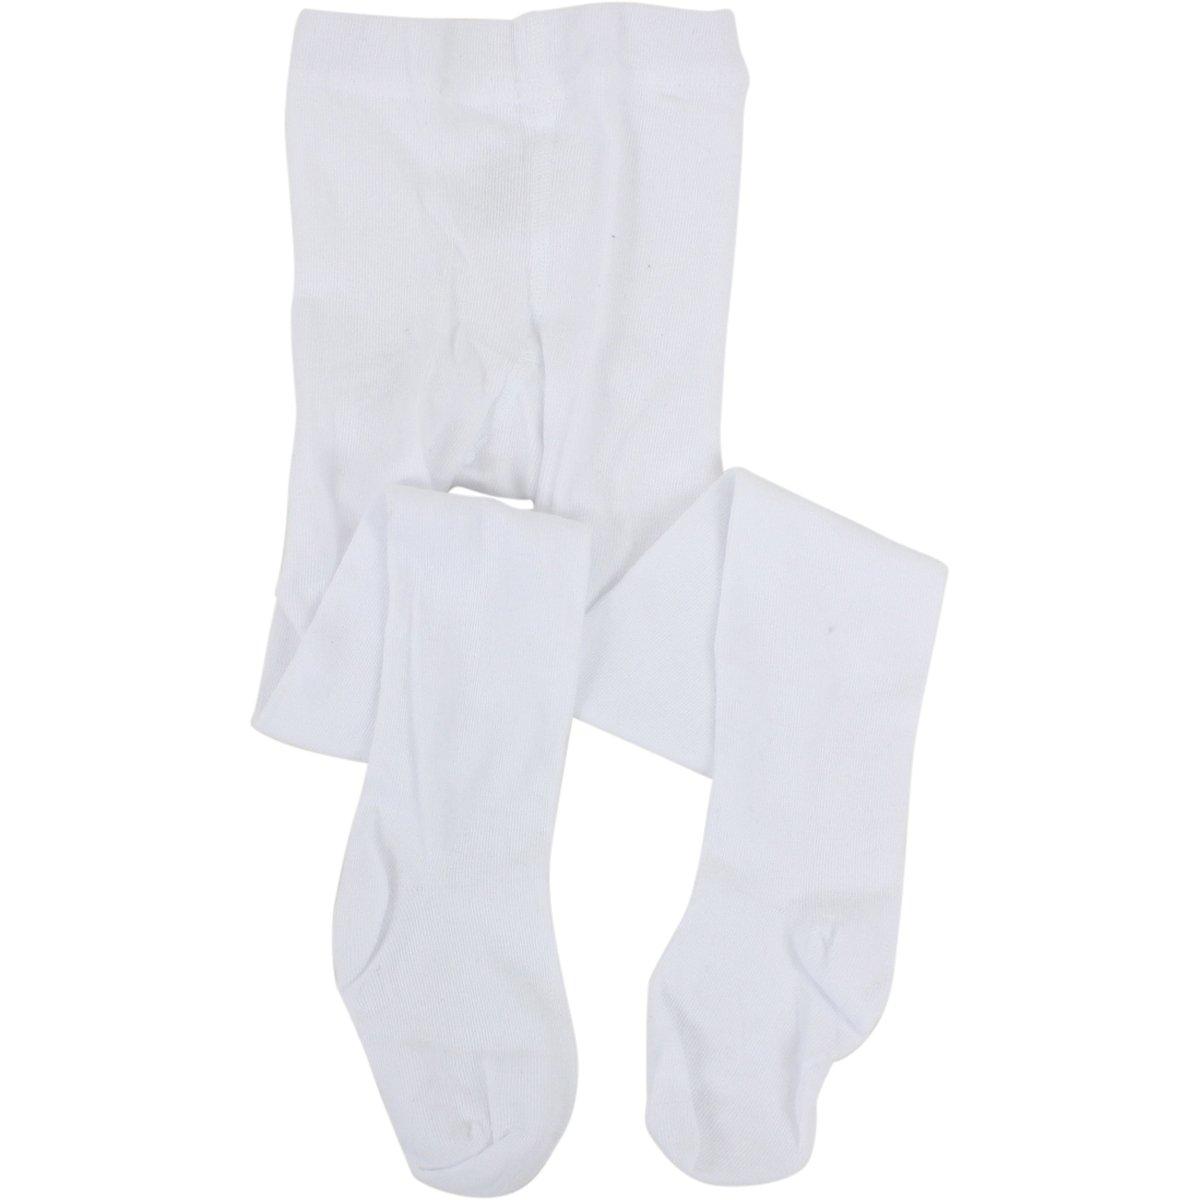 Stride Rite Toddler//Little Kid//Big Girls White Comfort Seam Toe Tights